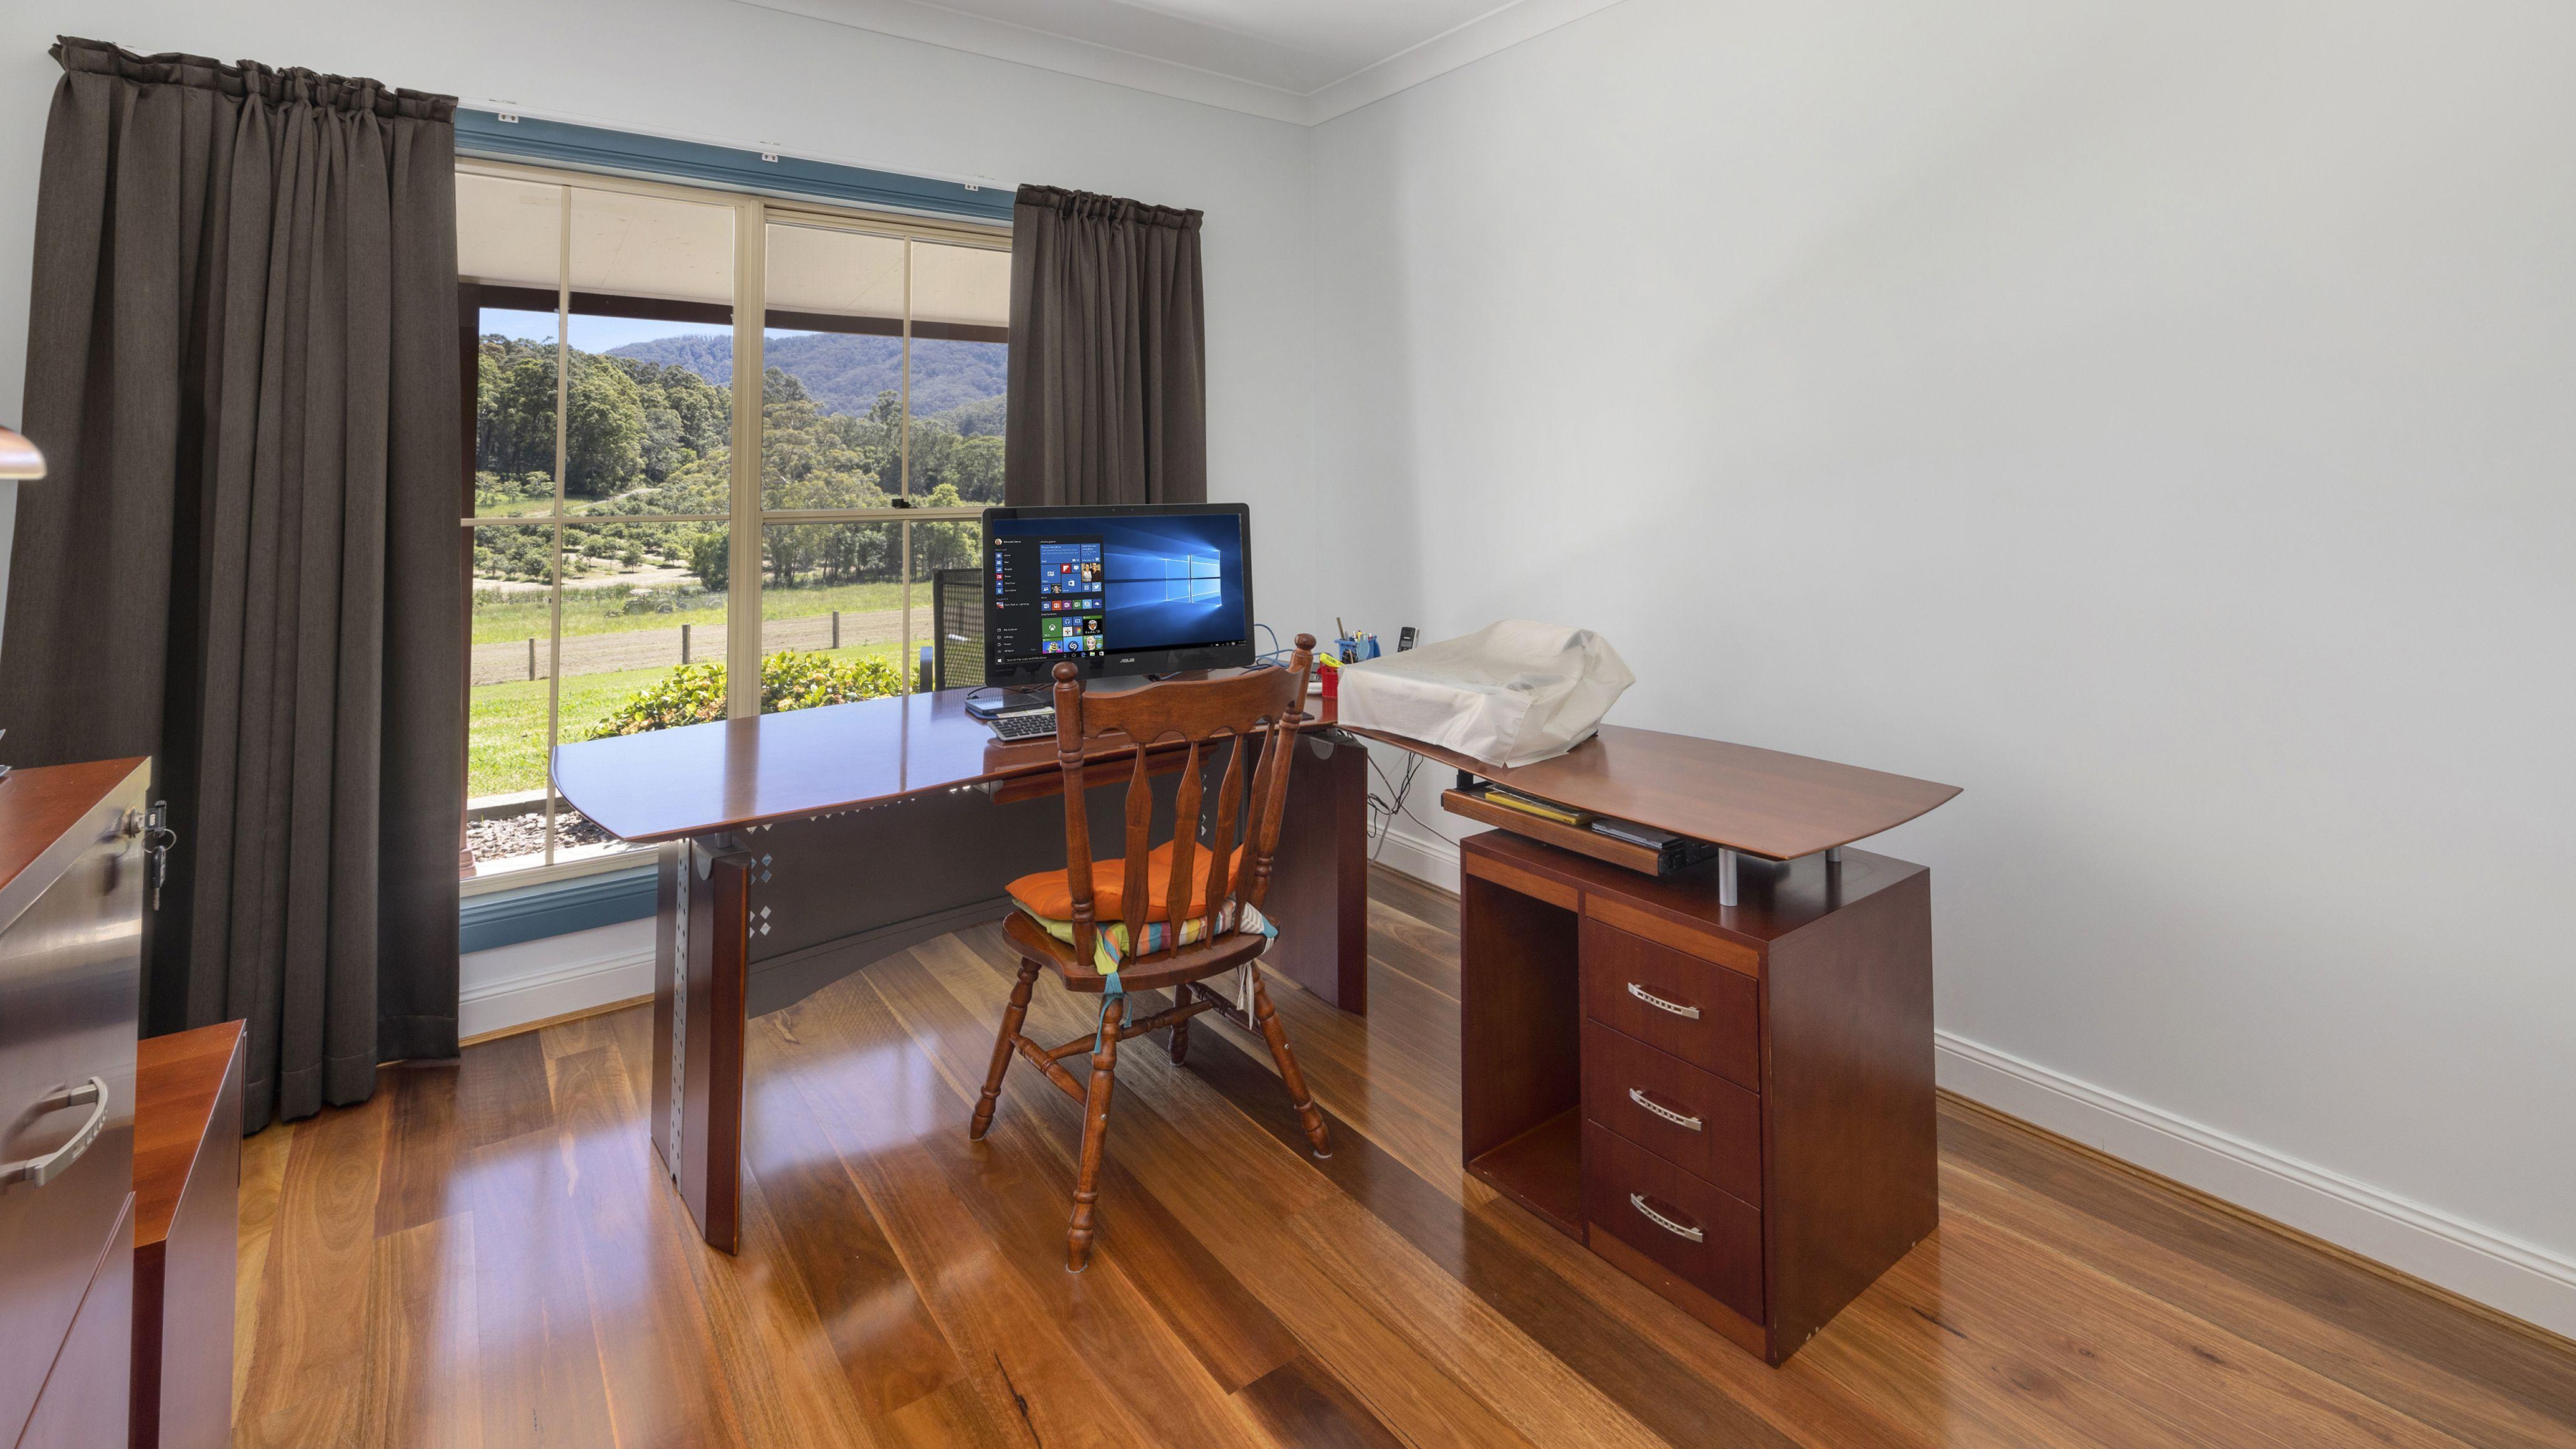 22 Crosses Lane, STEWARTS RIVER NSW 2443